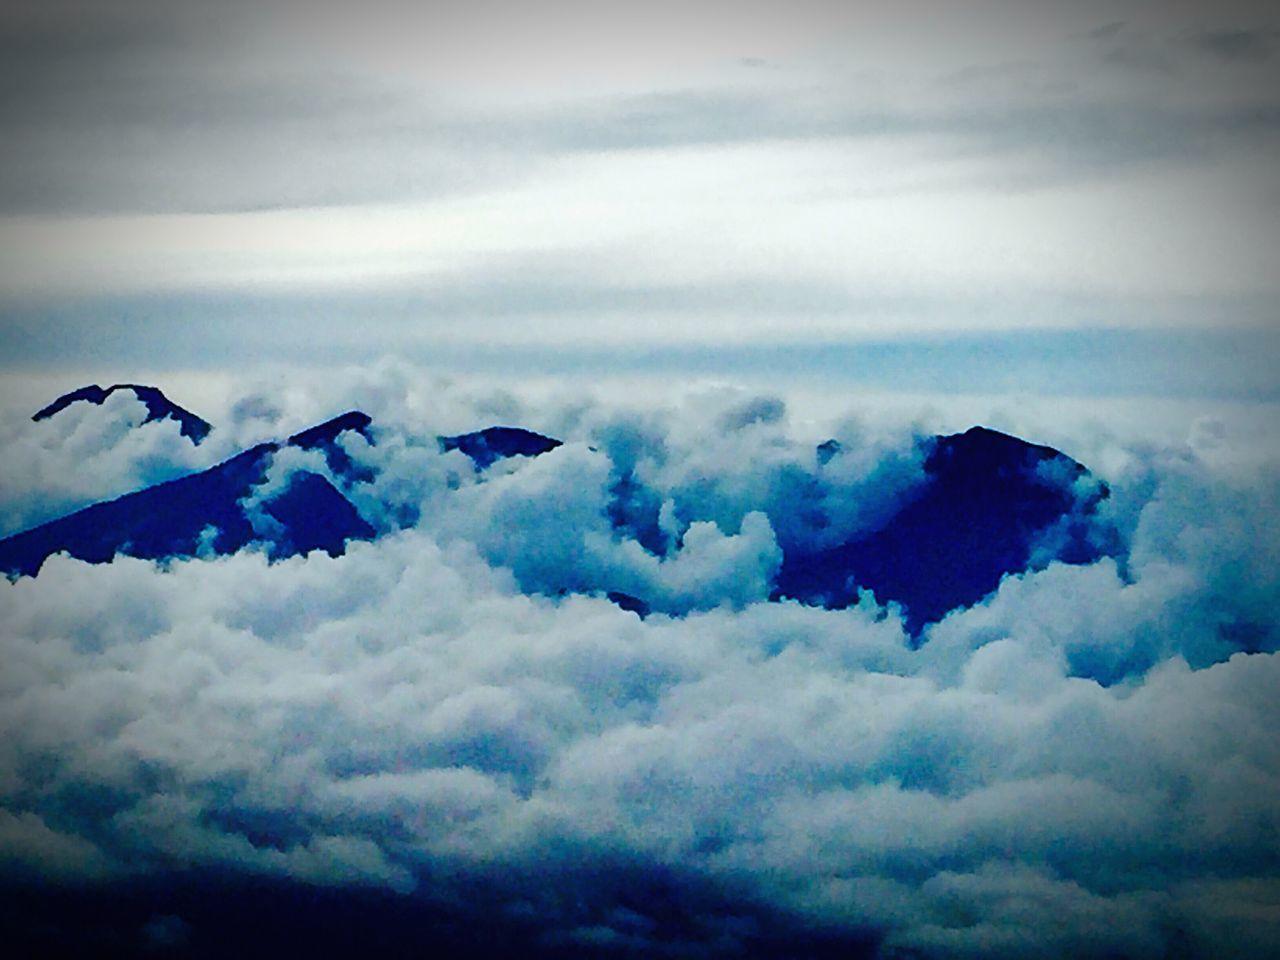 Mointains Clouds Mount Apo Mindanao Philippines